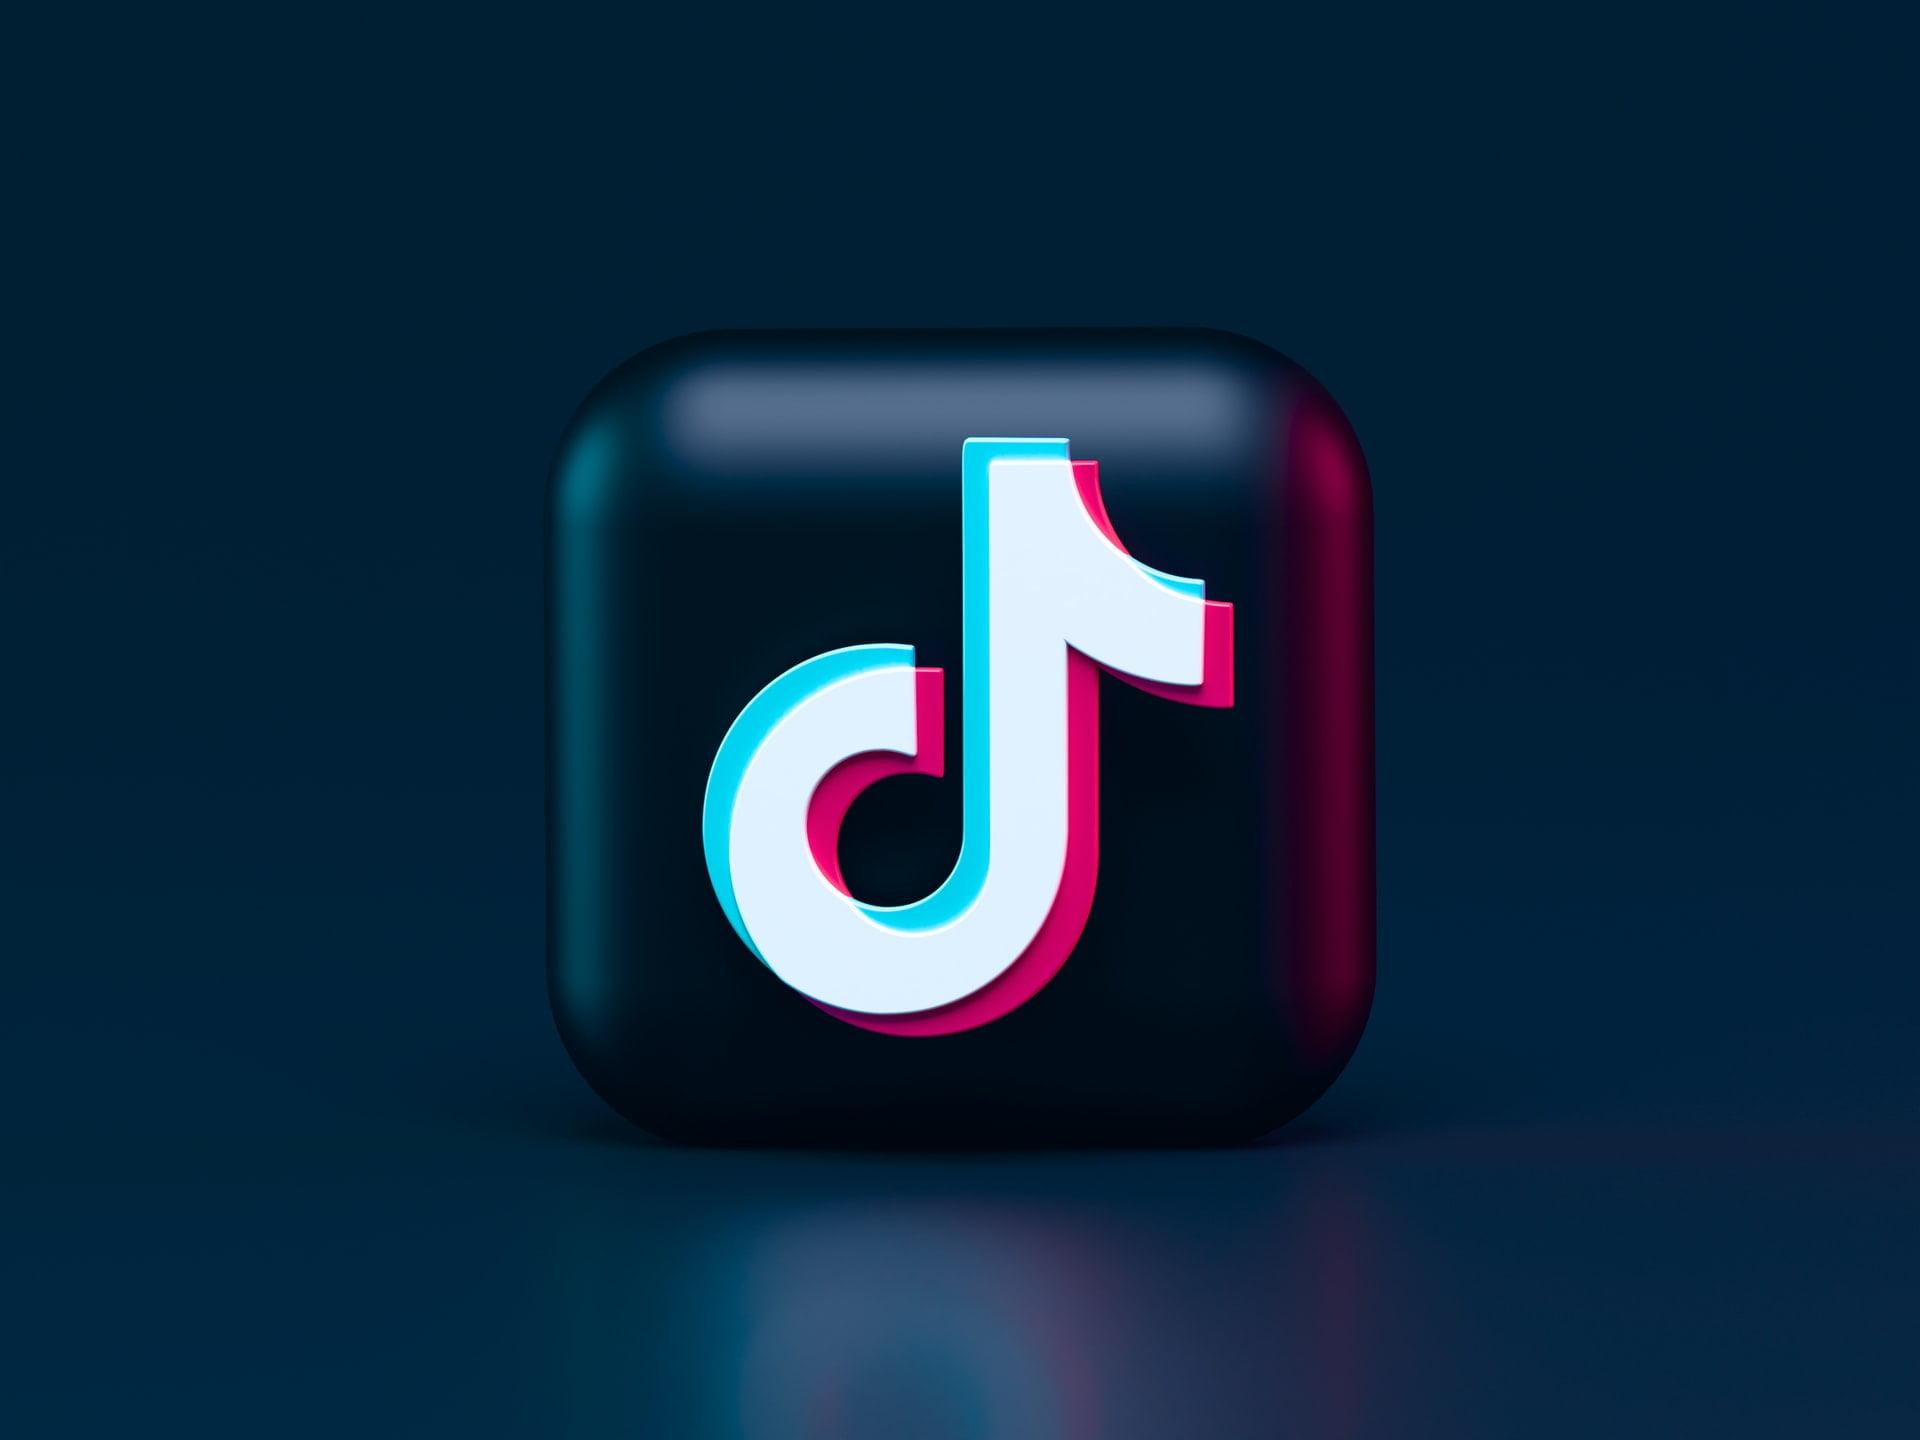 TikTok crosses 1 billion monthly active users globally